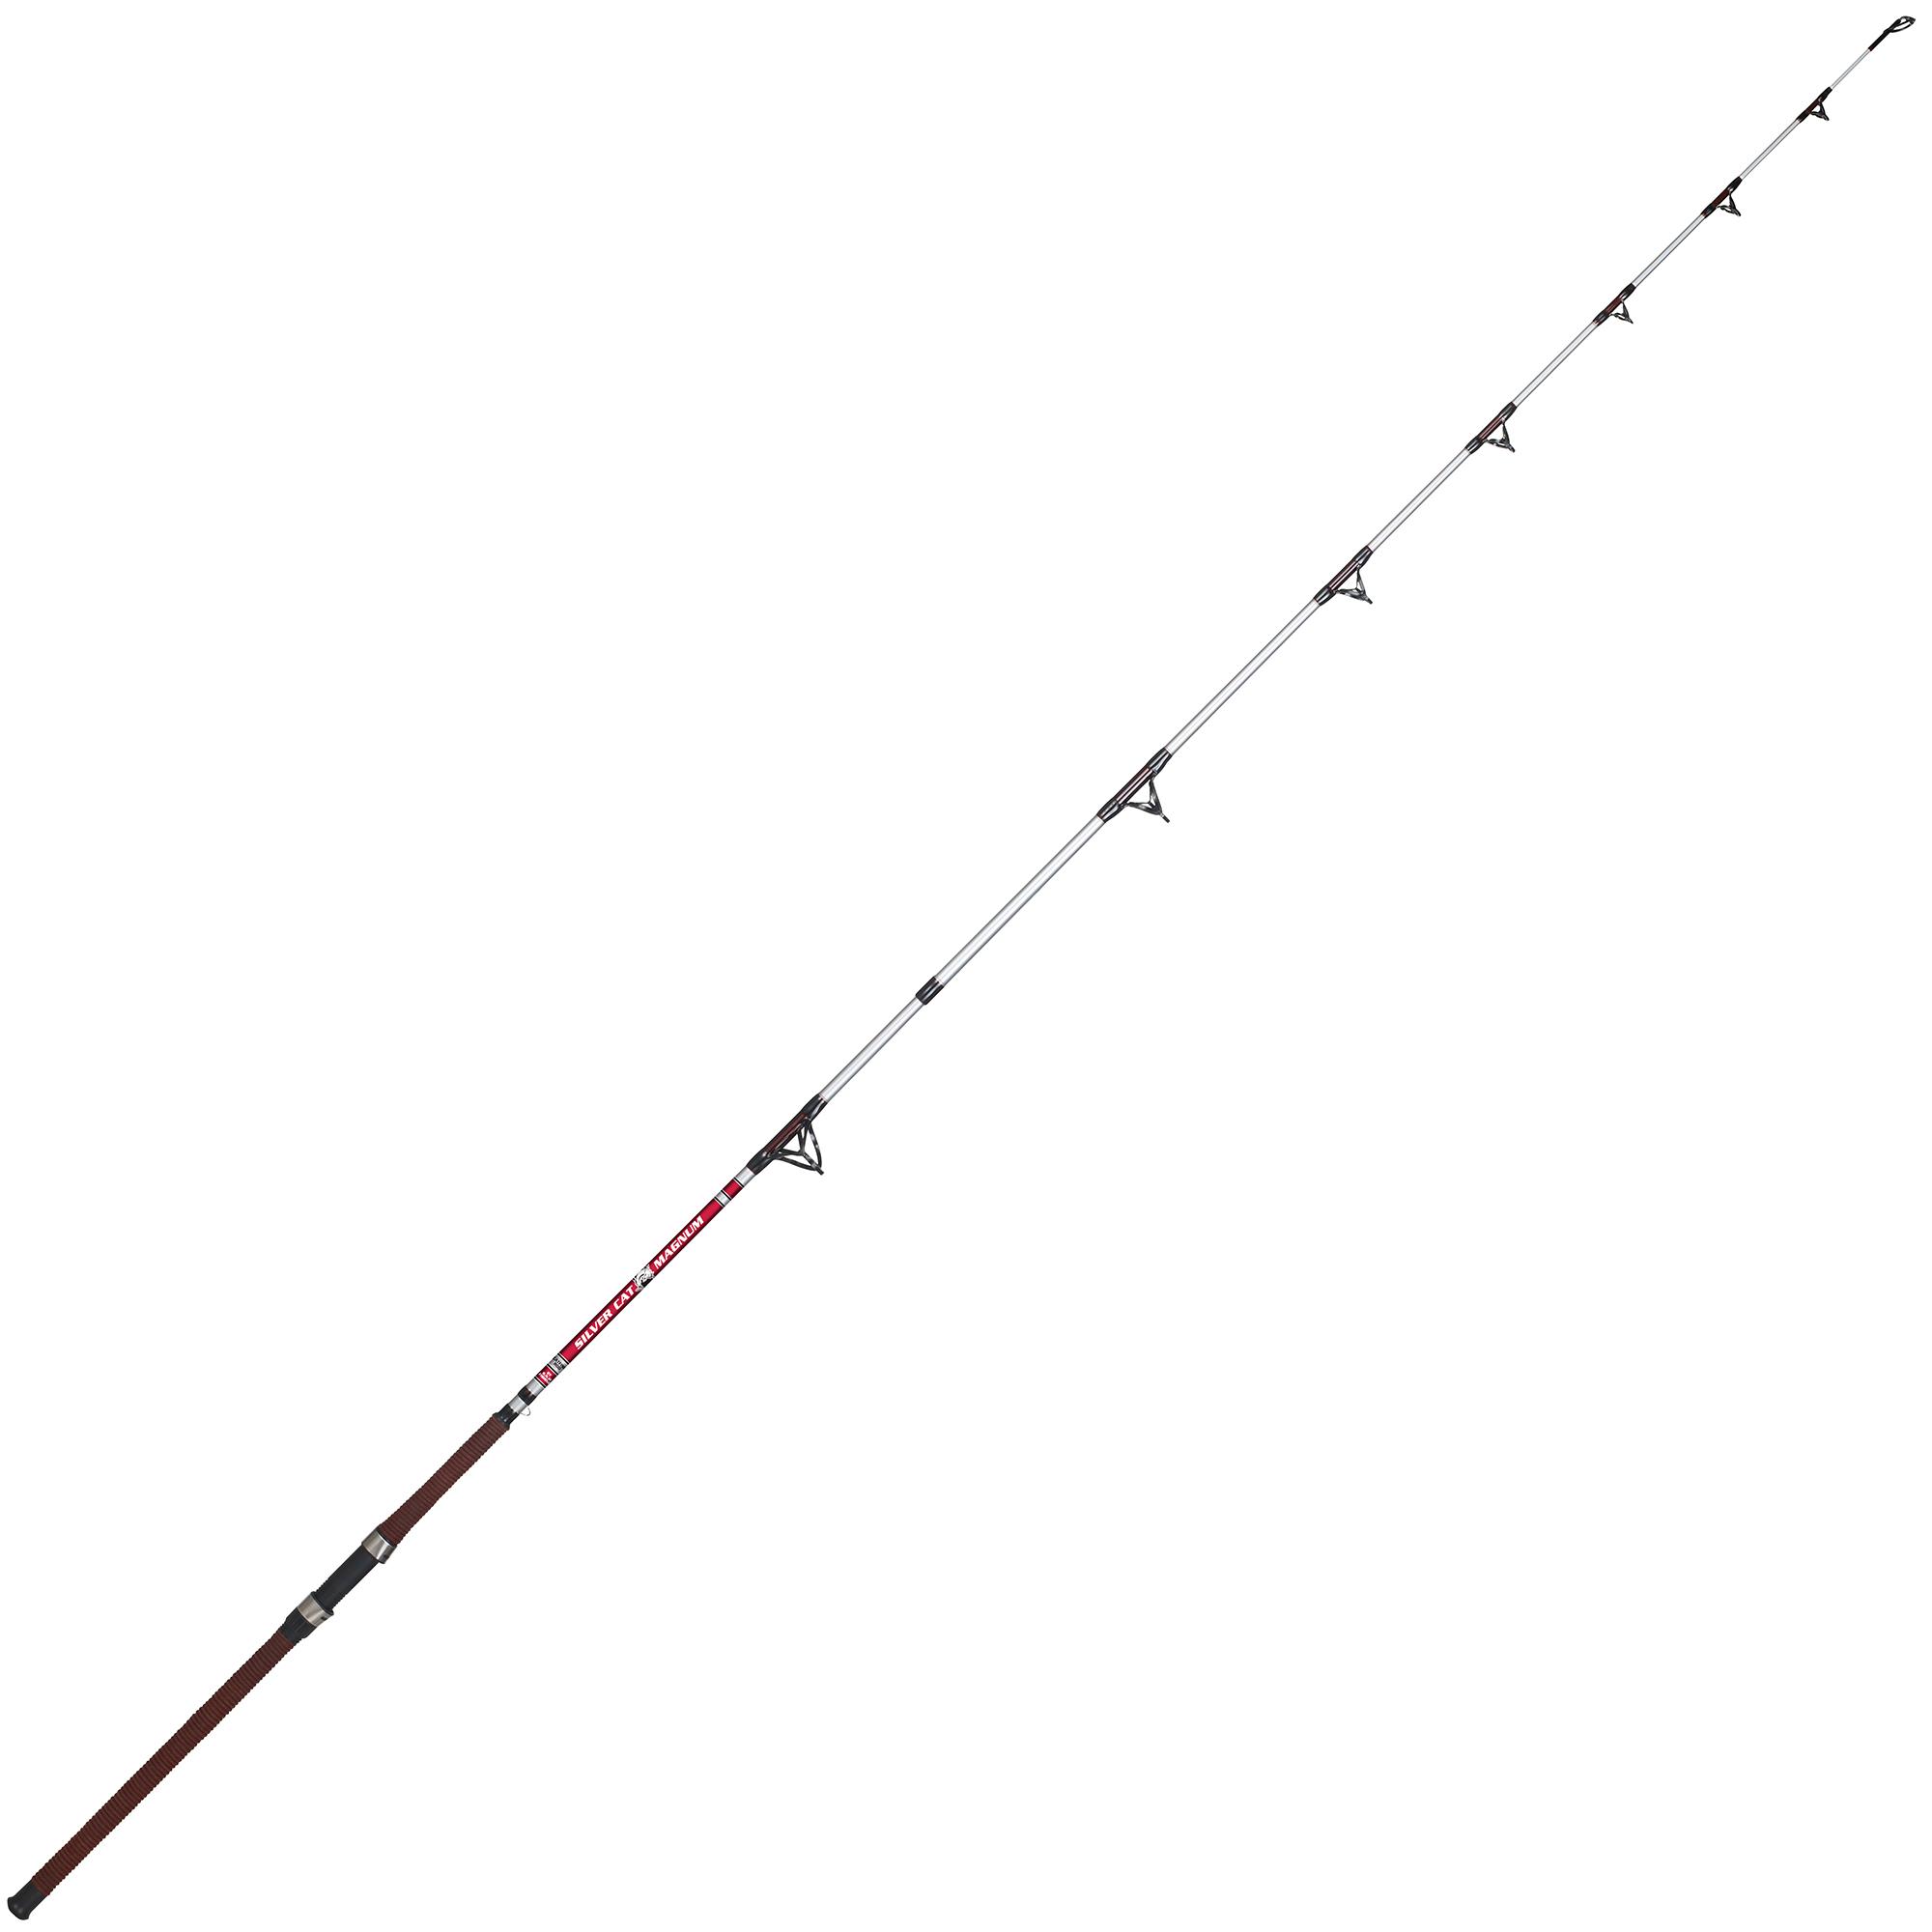 B'n'M Silver Cat Magnum Catfish Spinning Rod